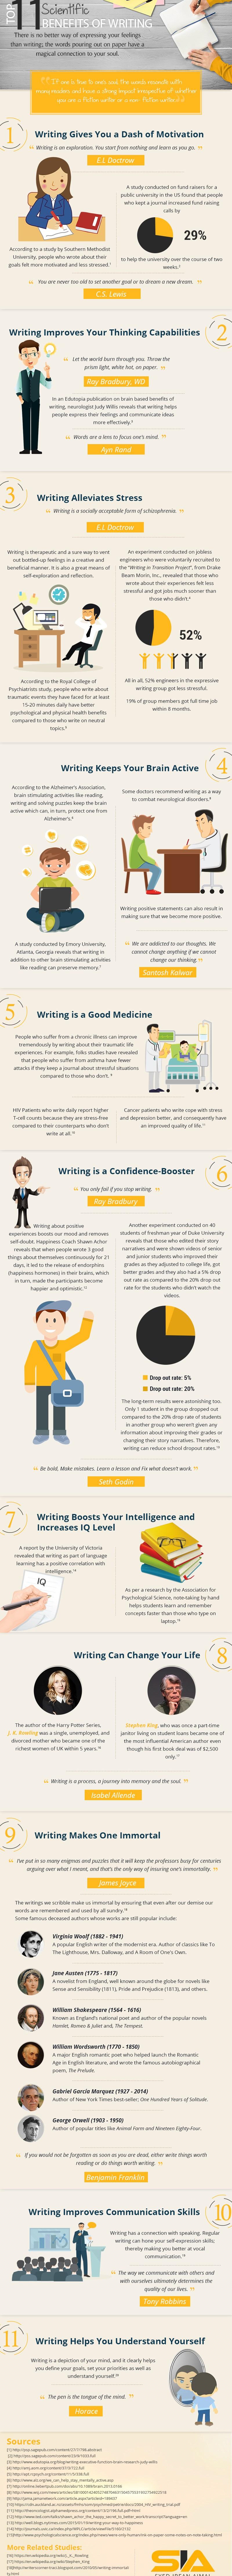 scientific-benefits-of-writing.jpg